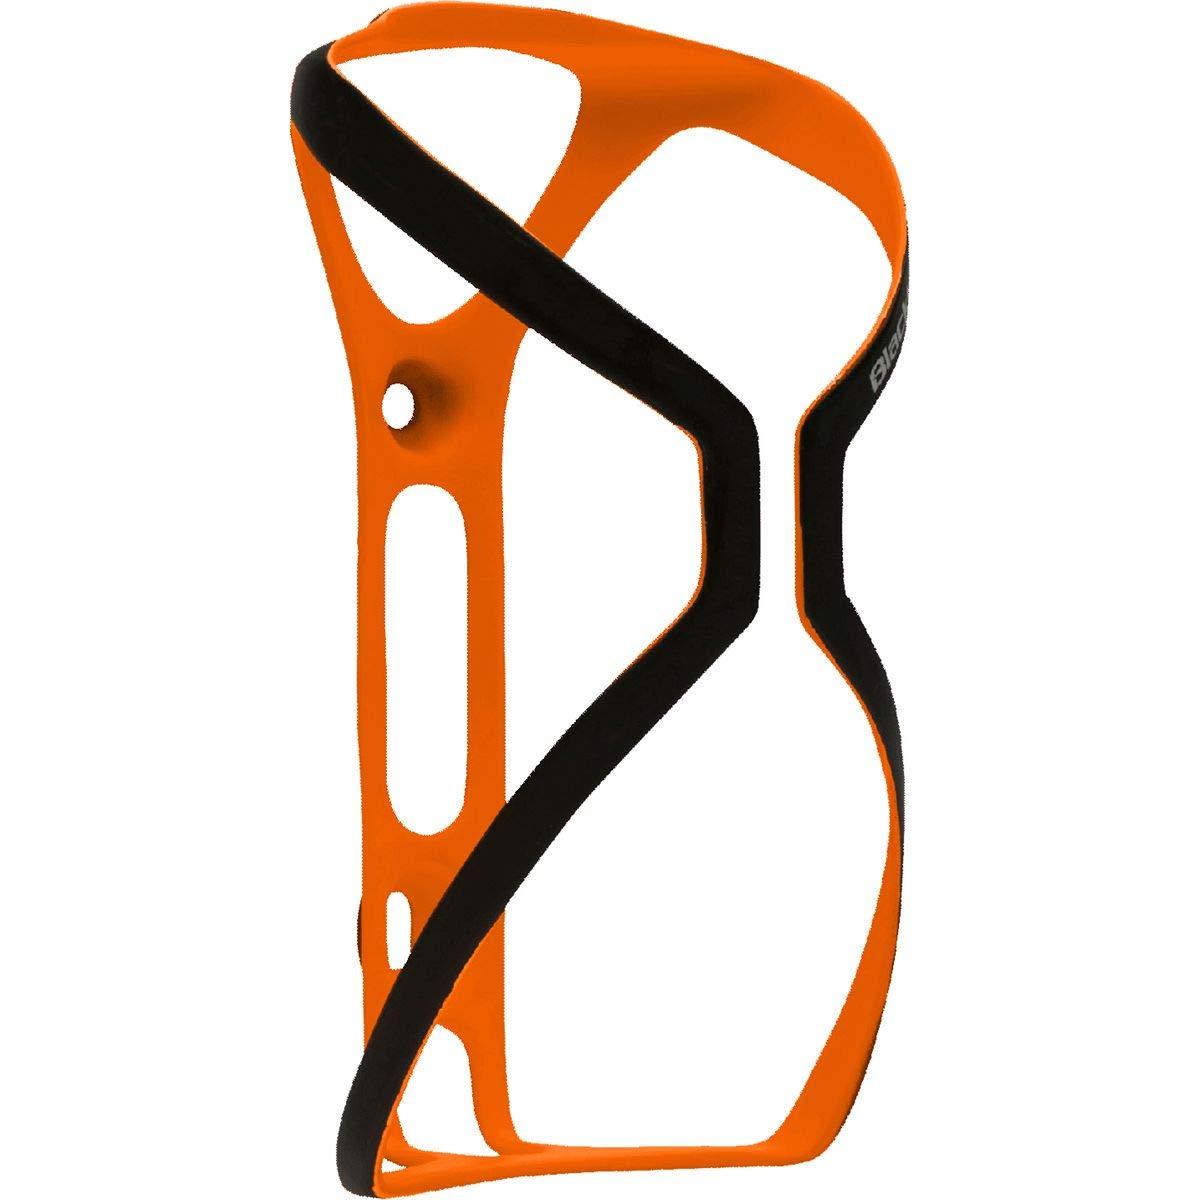 Blackburn Cinch Carbon Fiber Cage Matte Bright Orange, One Size by Blackburn